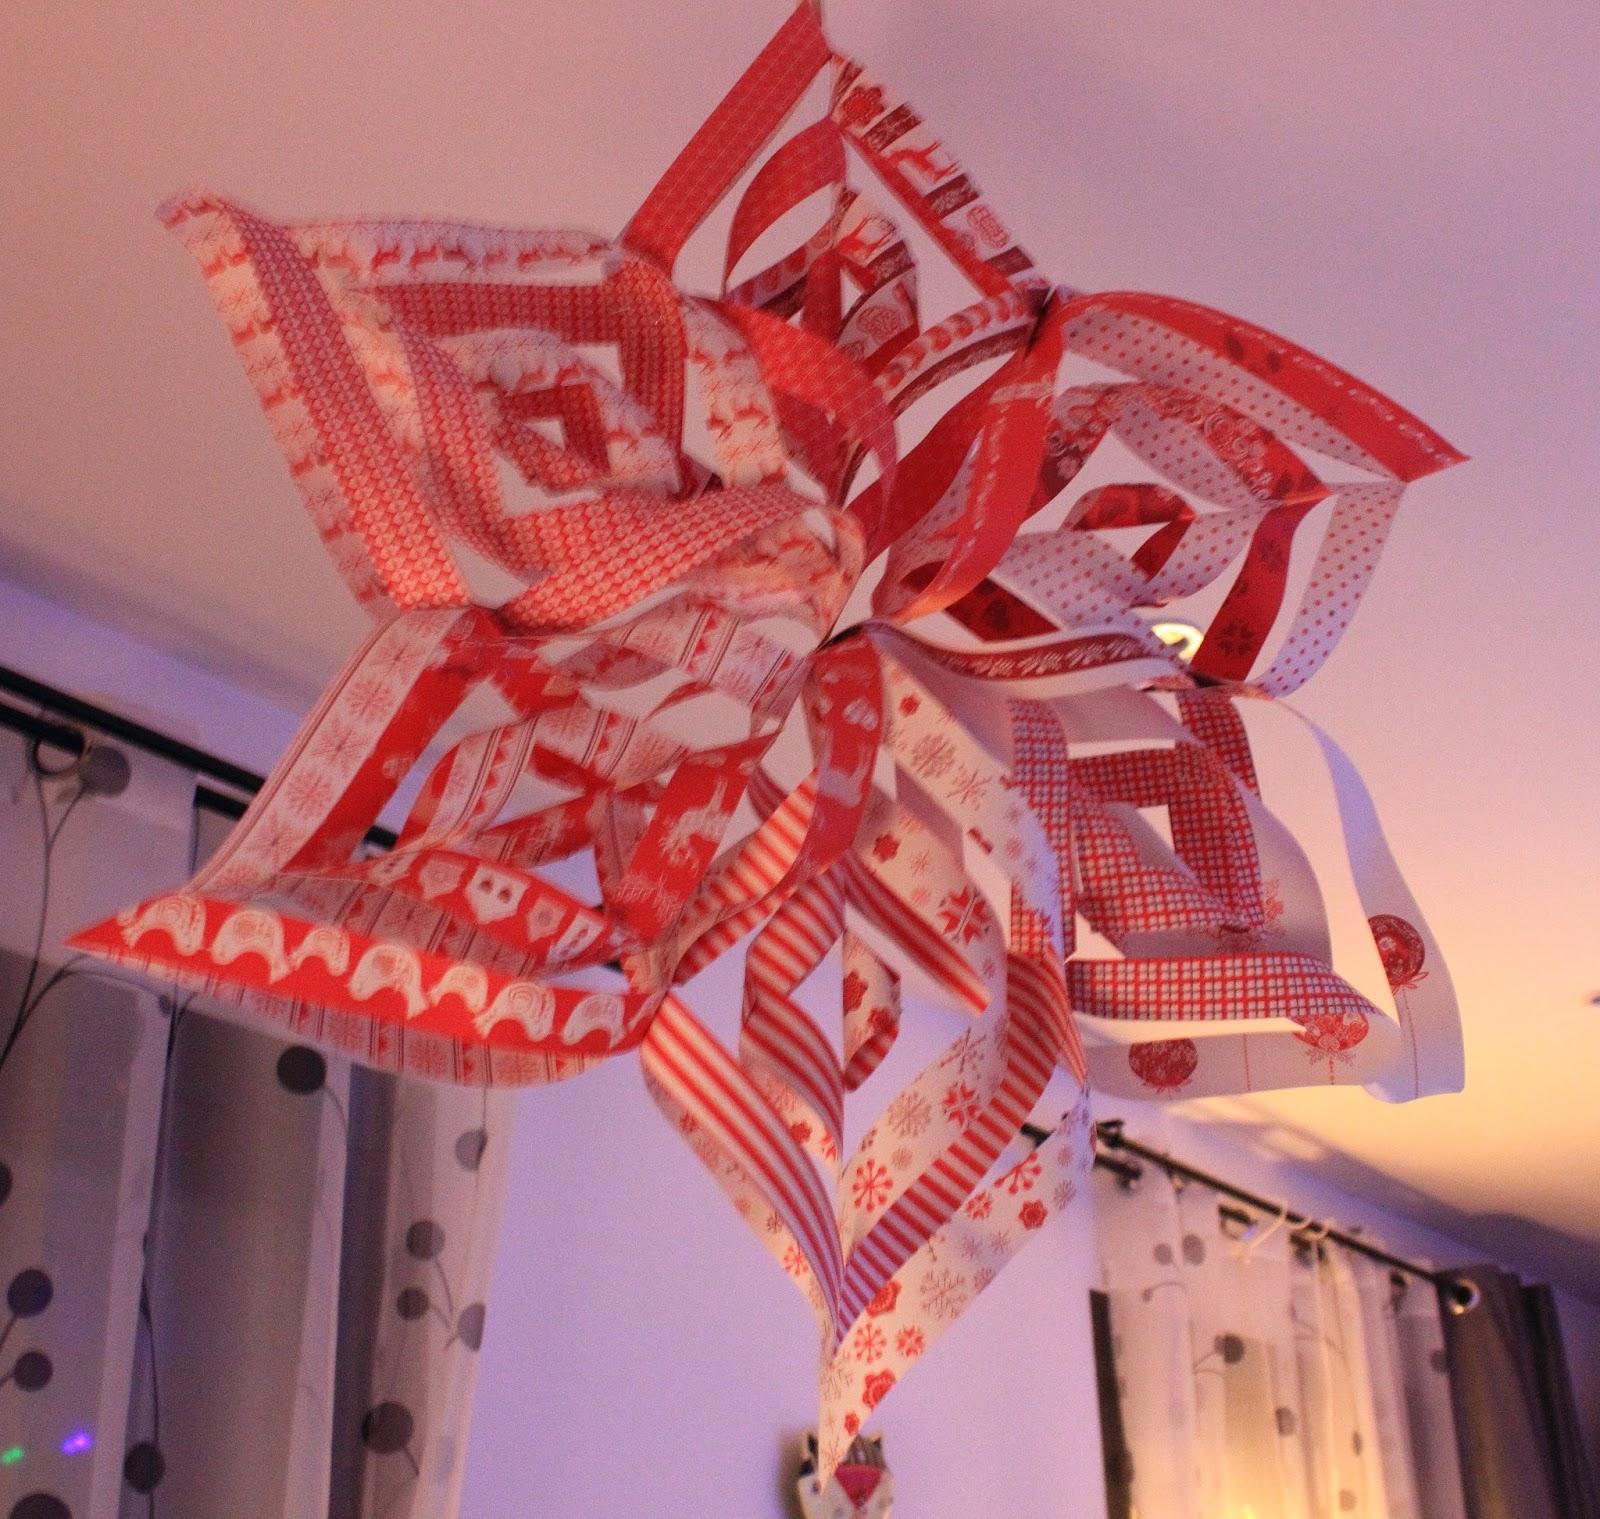 Coquillette coquette diy de noel 1 un joli flocon de neige en 3d en papier - Flocon de neige en papier origami ...